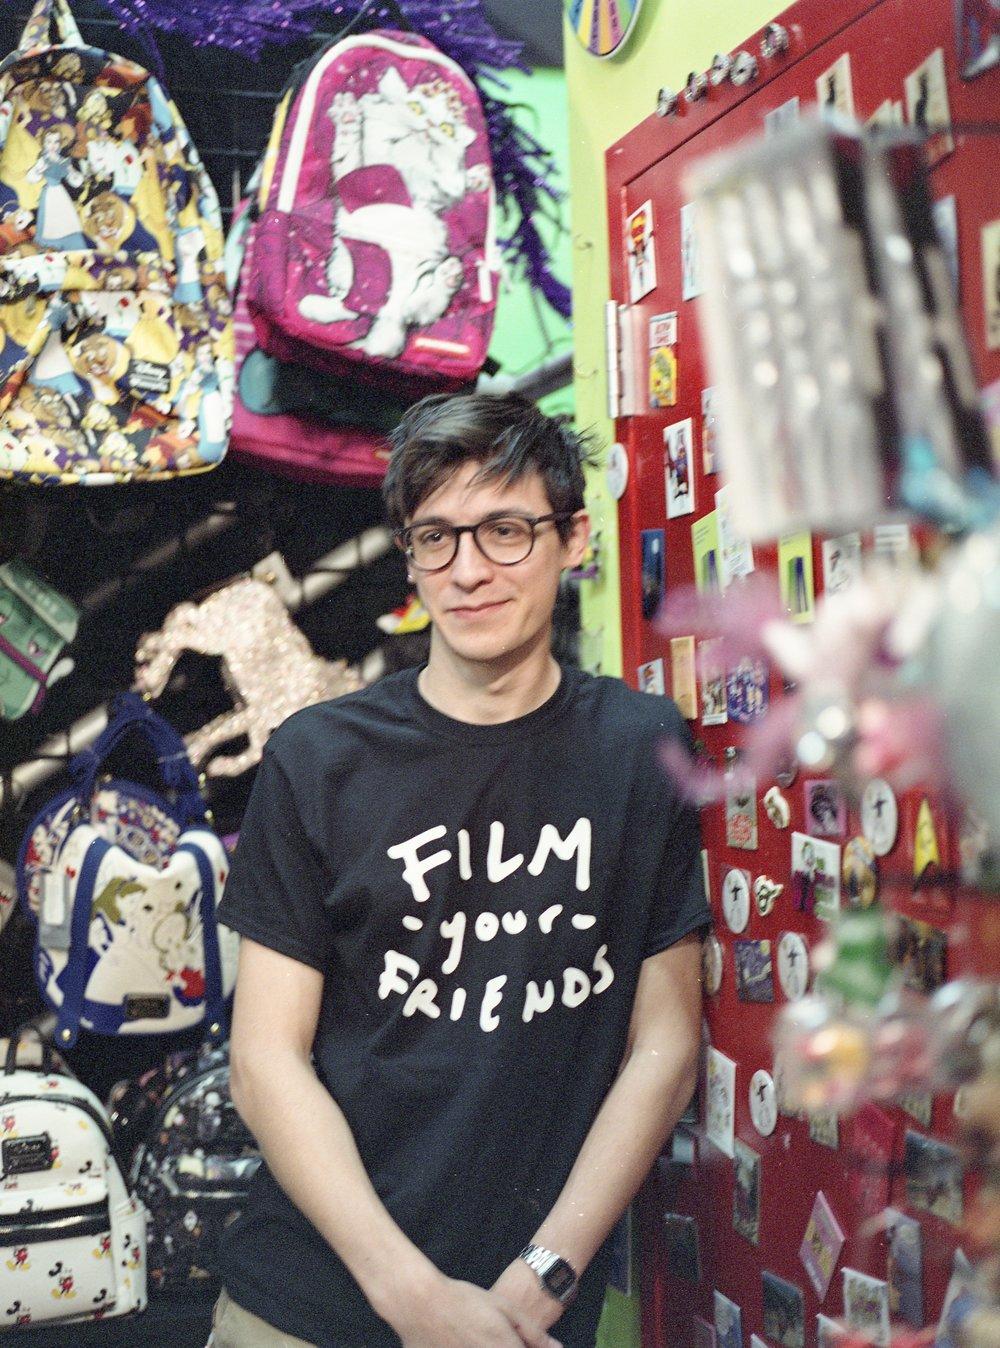 austin-filmmaker-from-texas-sxsw-2018-fujifilm-pro-400_40846320732_o.jpg